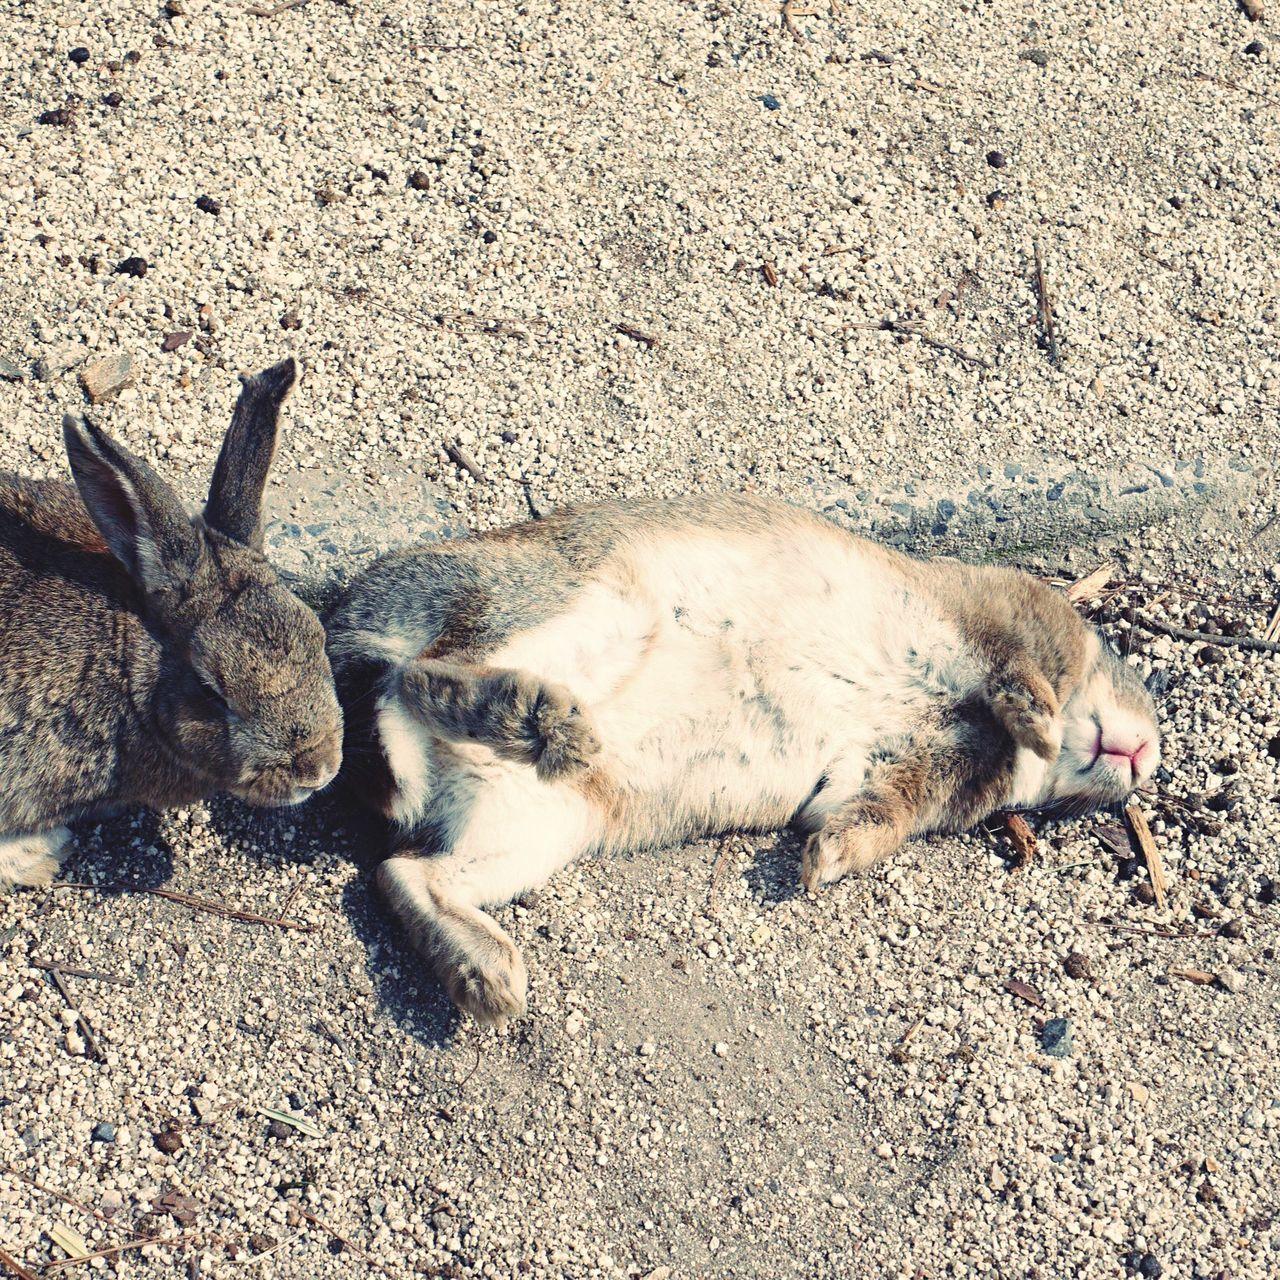 Sleeping rabbits 😄 Rabbit Rabbits Rabbit ❤️ Animal Themes Animals In The Wild Animals Animal Animal Wildlife Funny Beach Photography Beautiful Nature Island Animal Photography Nature Photography Nature_collection Cute Beautiful Pretty Nature Japanese  Outdoors